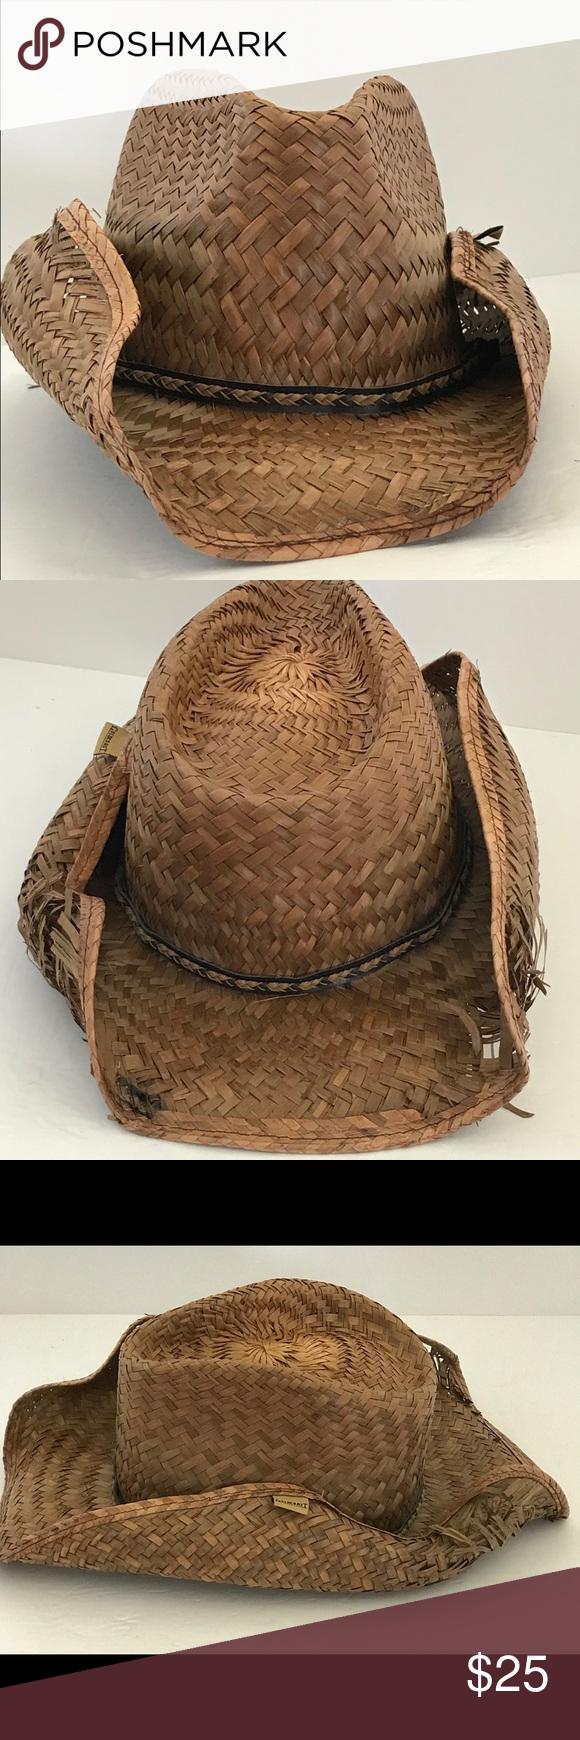 ac50d75179abb GoldCoast Peter Grimm Cowboy Drifter Straw Hat Gold Coast Sunwear Peter  Grimm Straw Distressed Look Cowboy Drifter Hat Gold Coast Accessories Hats